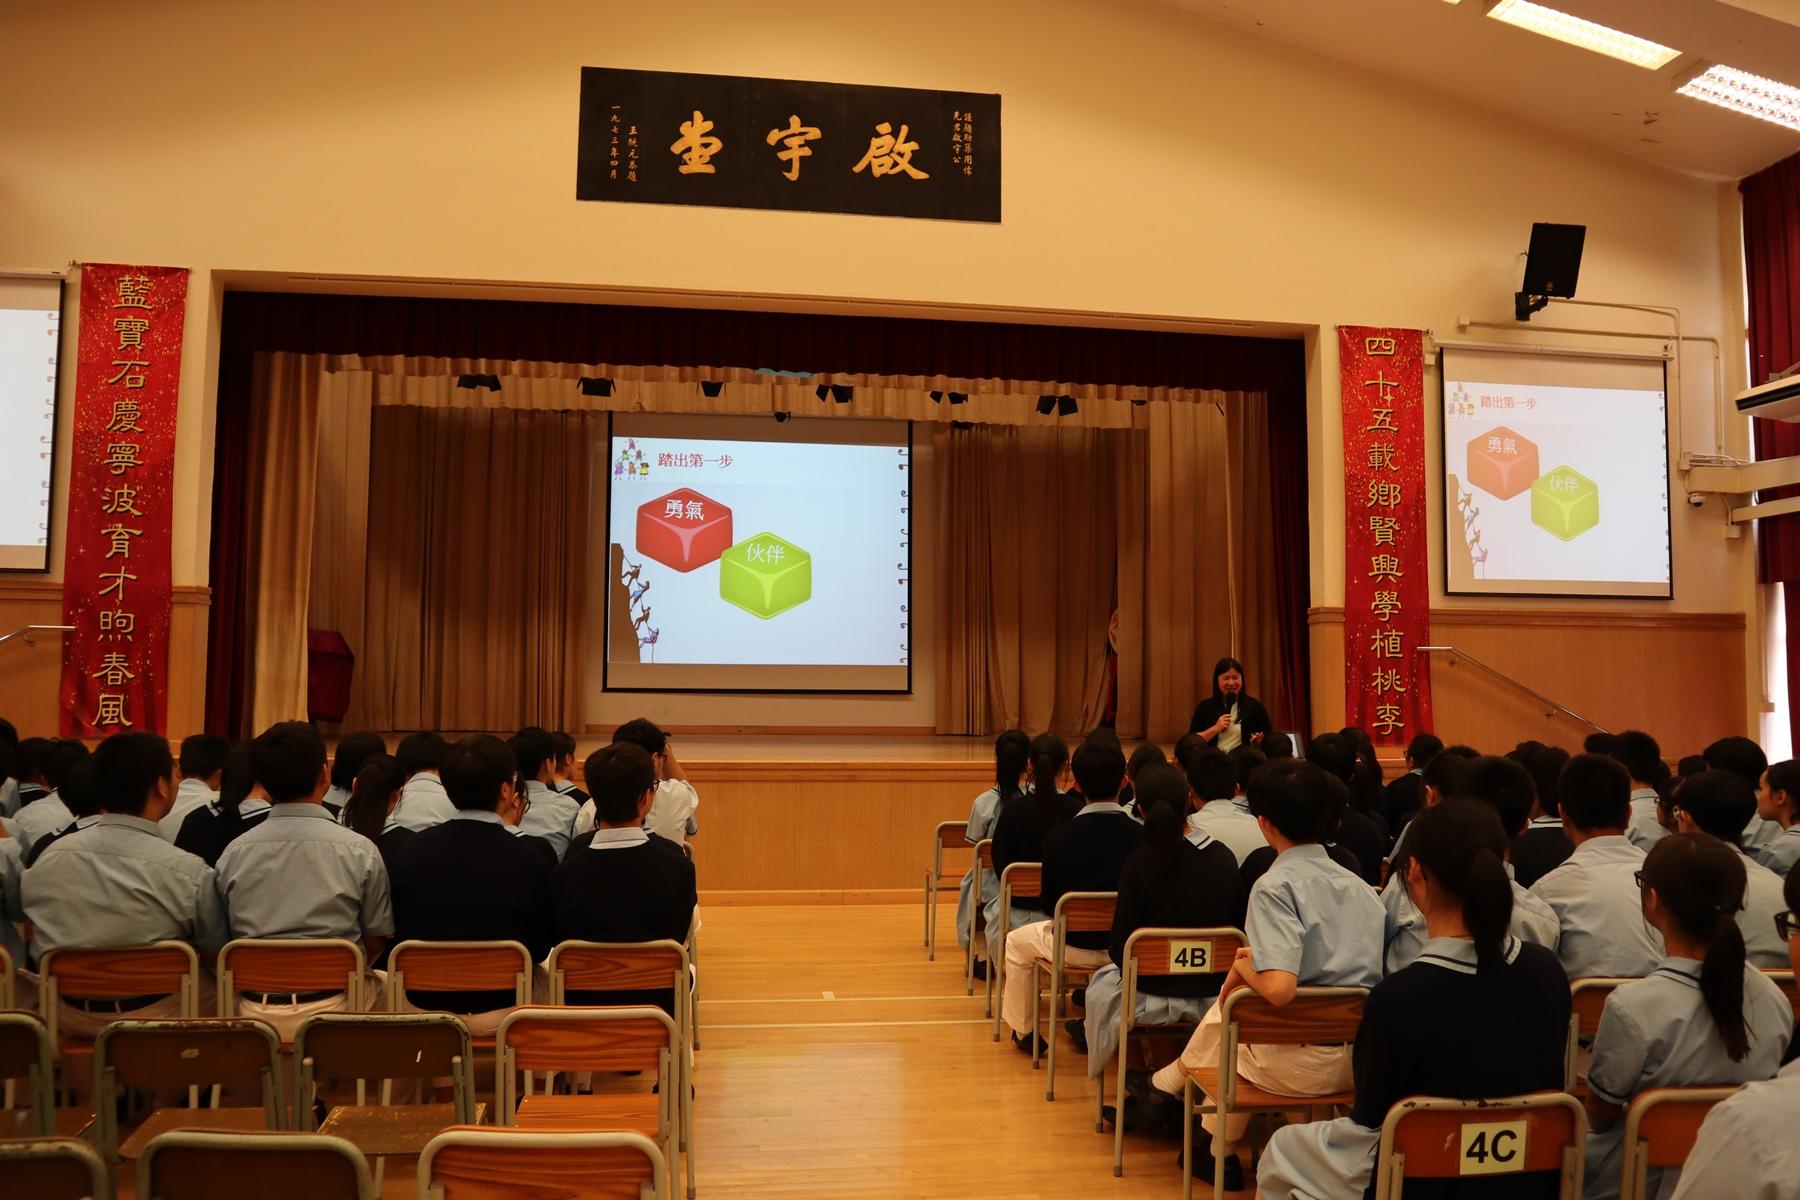 http://npc.edu.hk/sites/default/files/img_9671_2.jpg